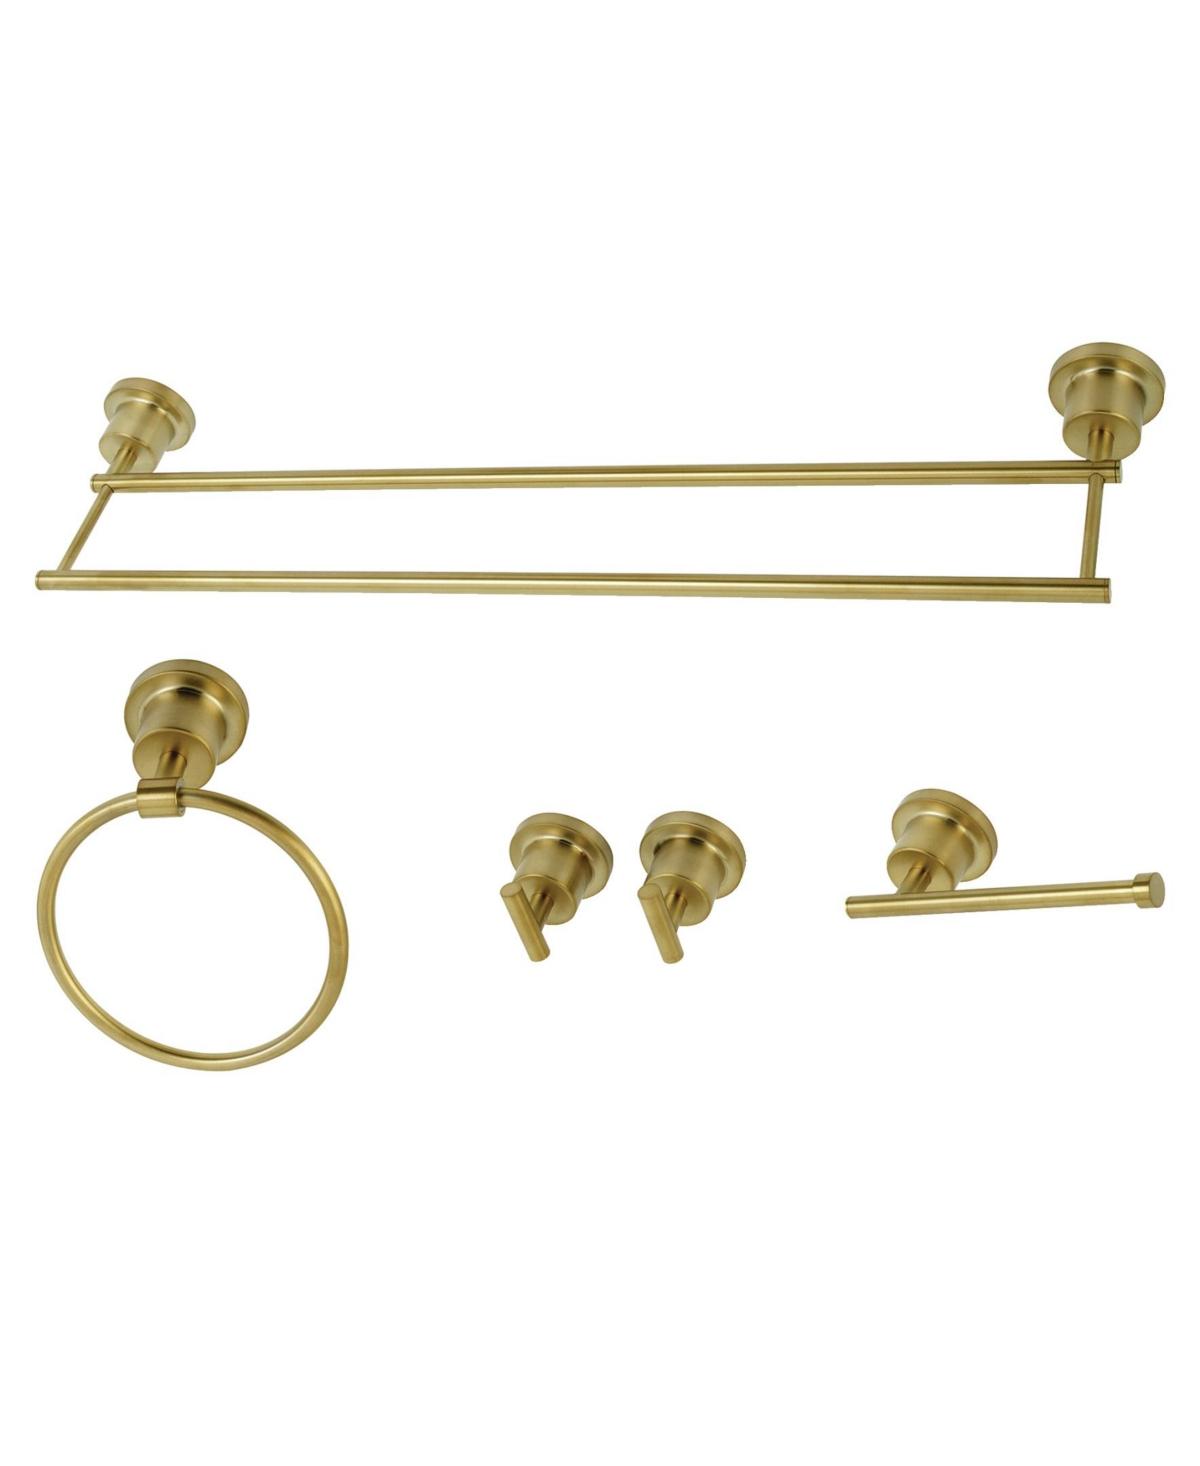 Kingston Brass Concord Dual-Towel Bar 5-Pc. Bathroom Accessory Set Bedding